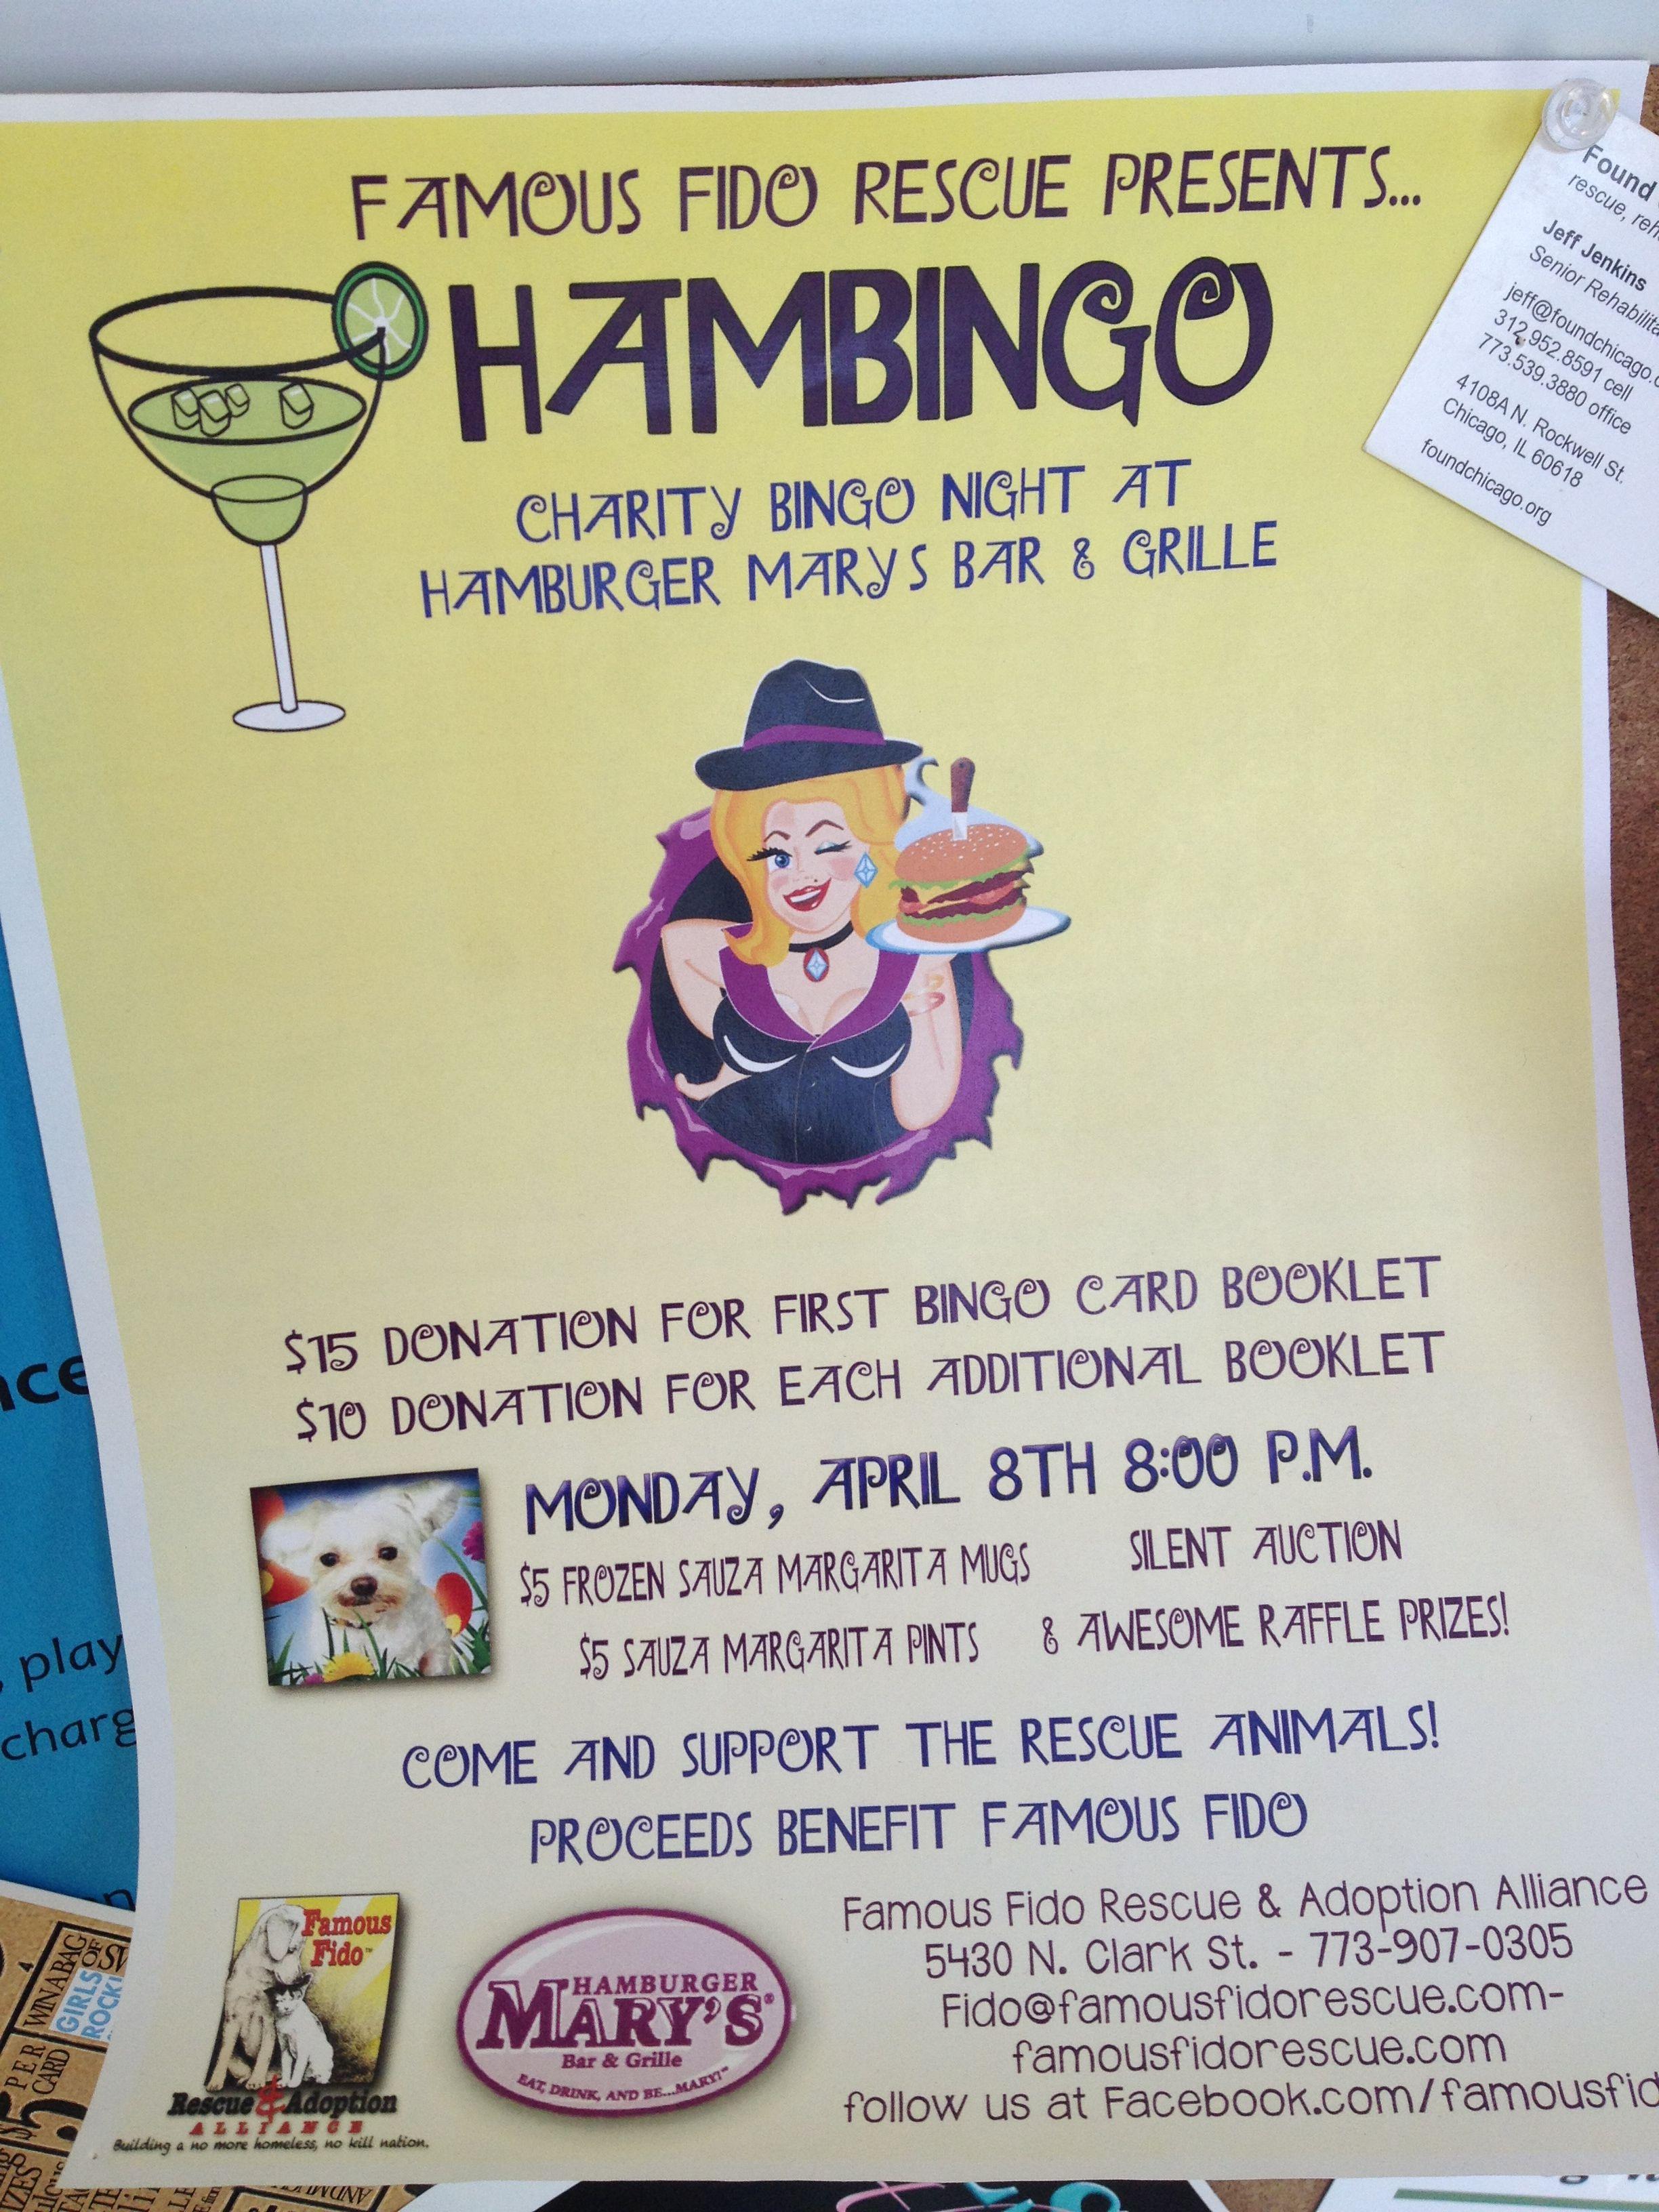 Hambingo Fundraiser